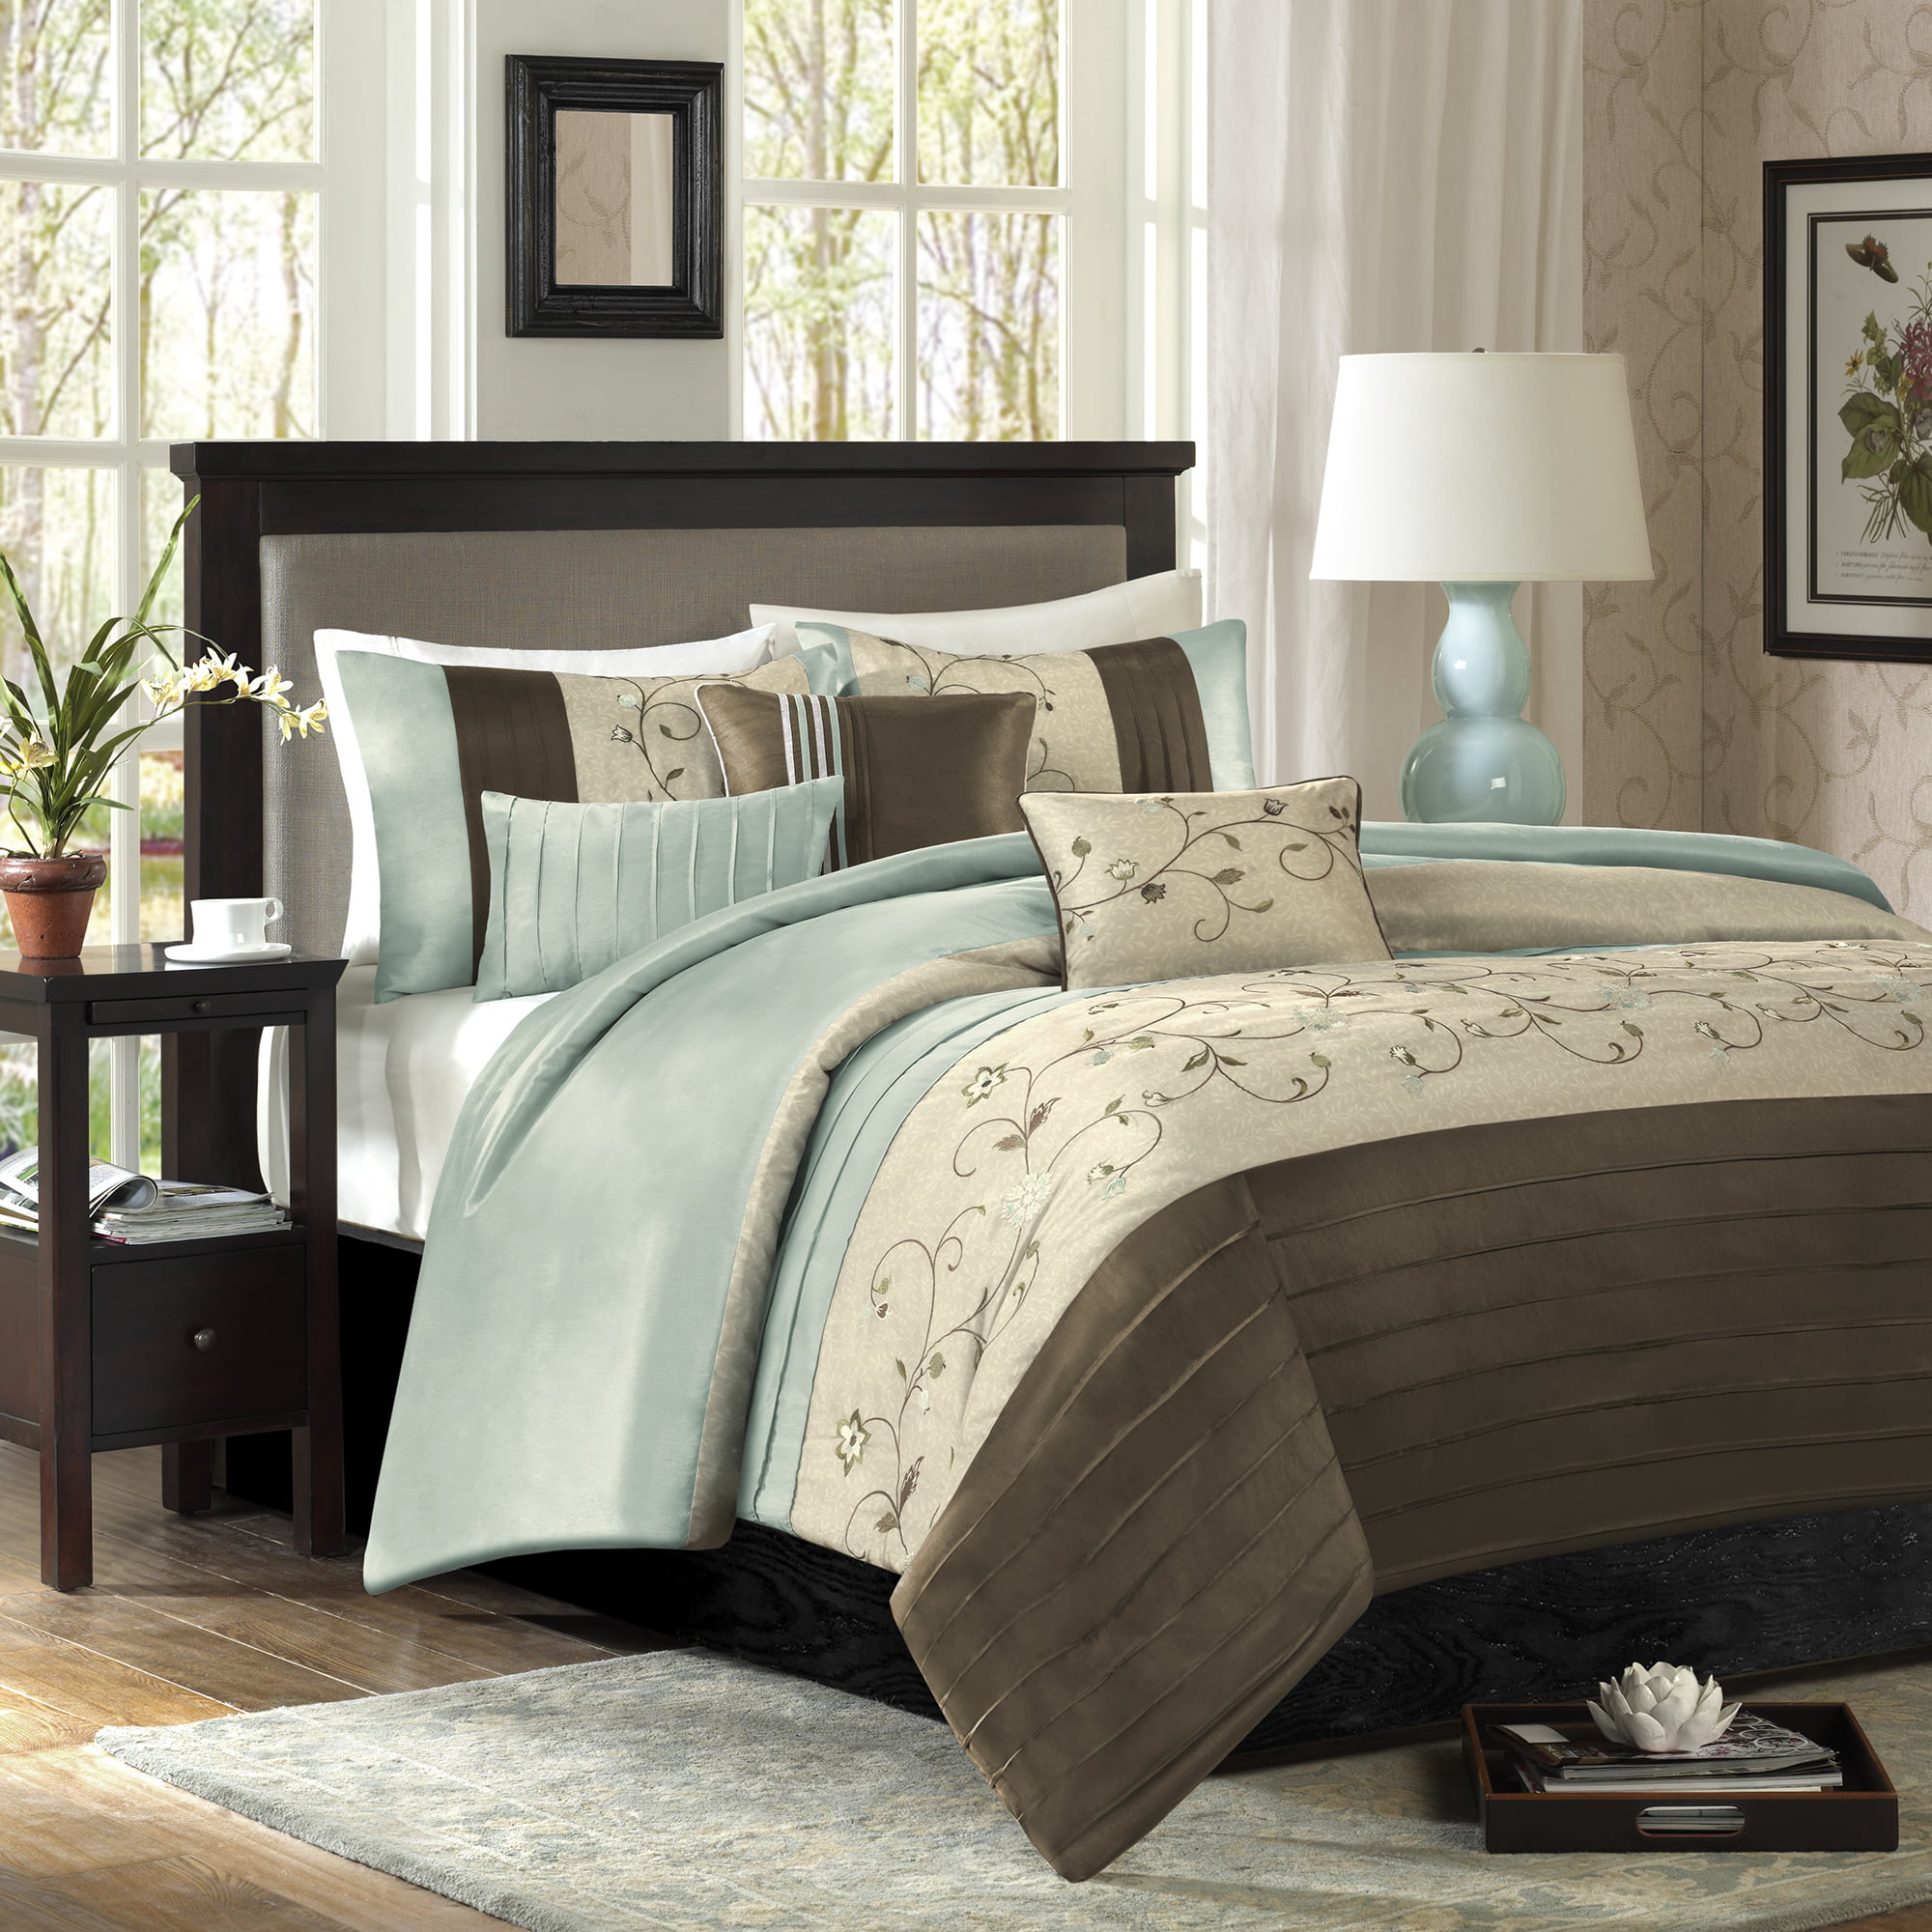 Monroe 7 Piece Embroidered Comforter Set - Blue (California King)